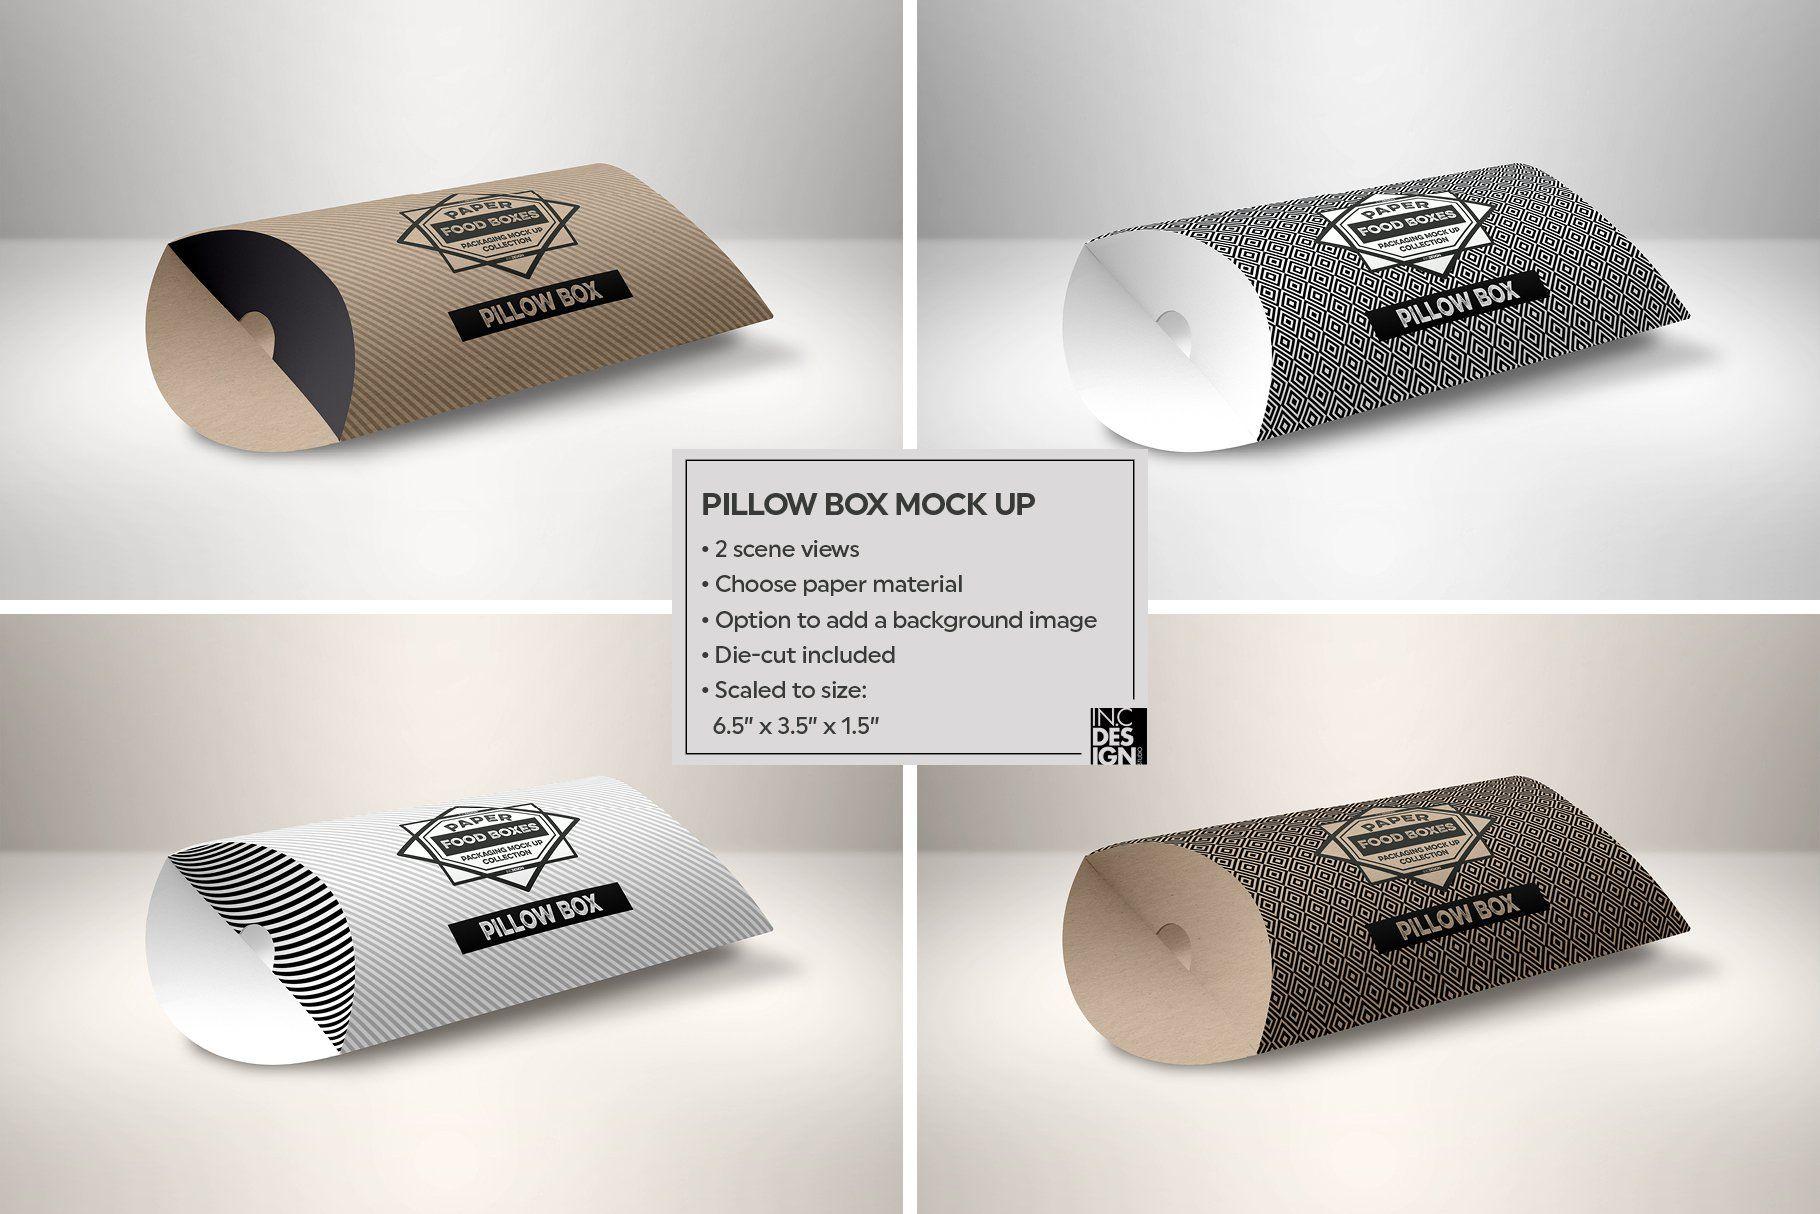 Download Pillow Box Packaging Mockup Packaging Mockup Pillow Box Free Packaging Mockup